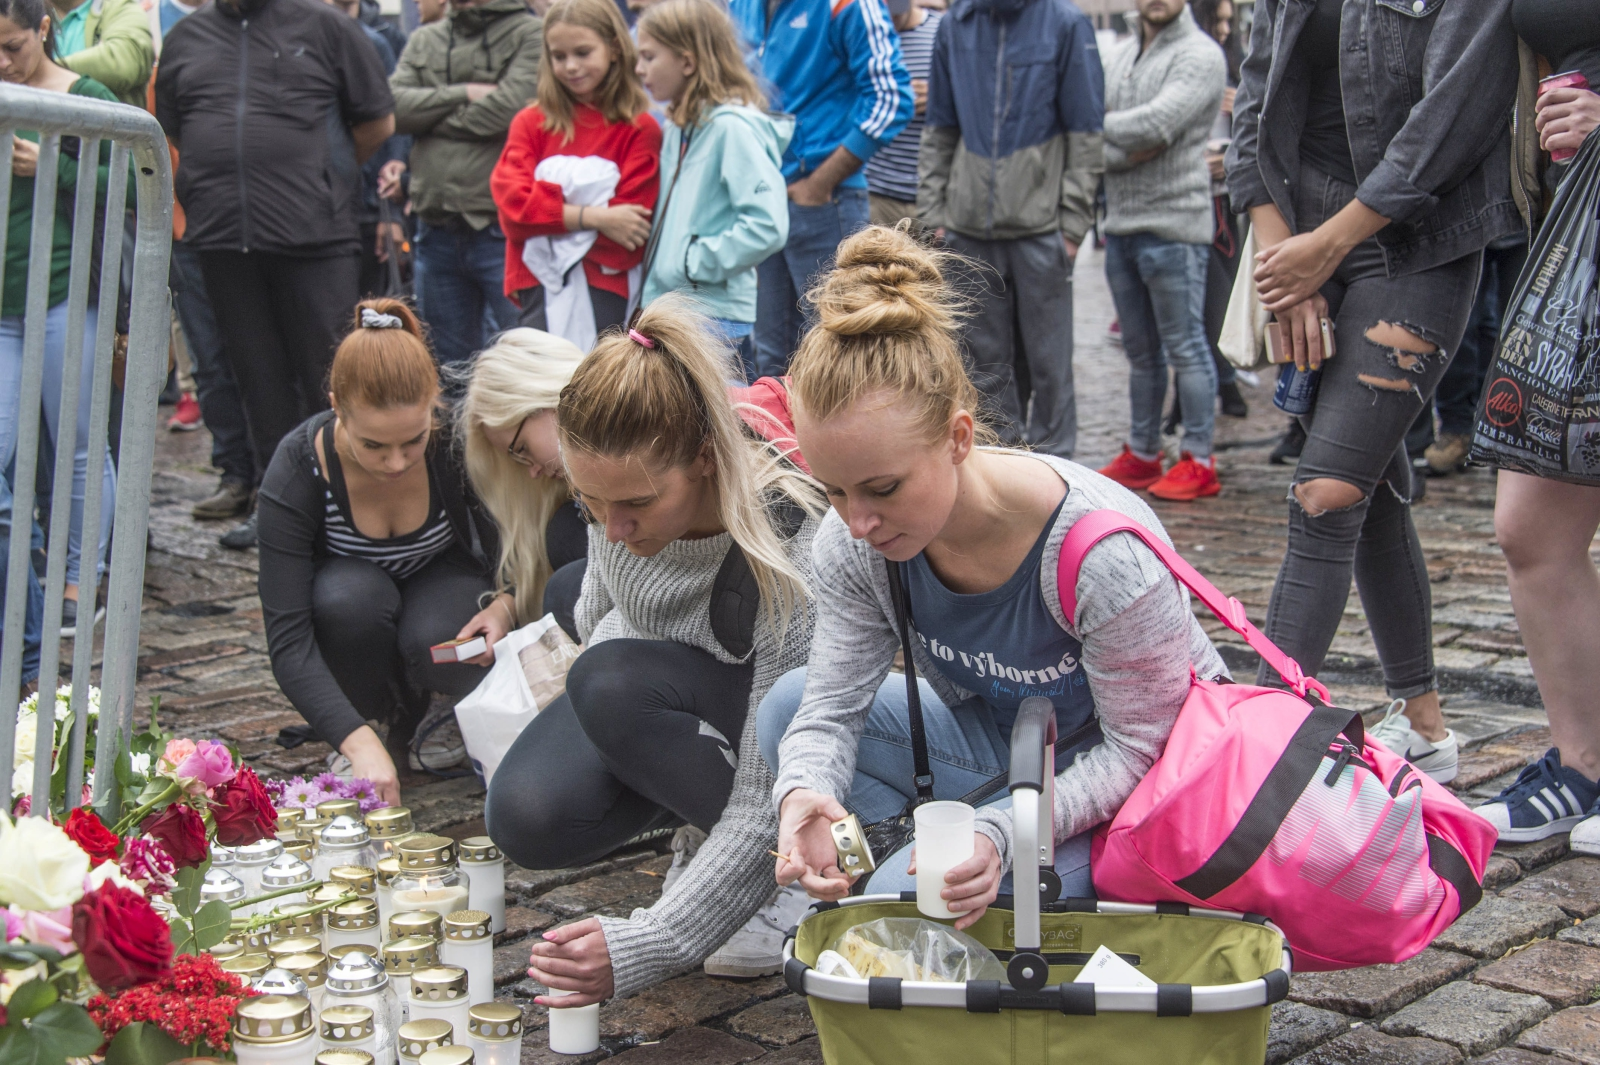 Po atakach w Turku, Finlandia